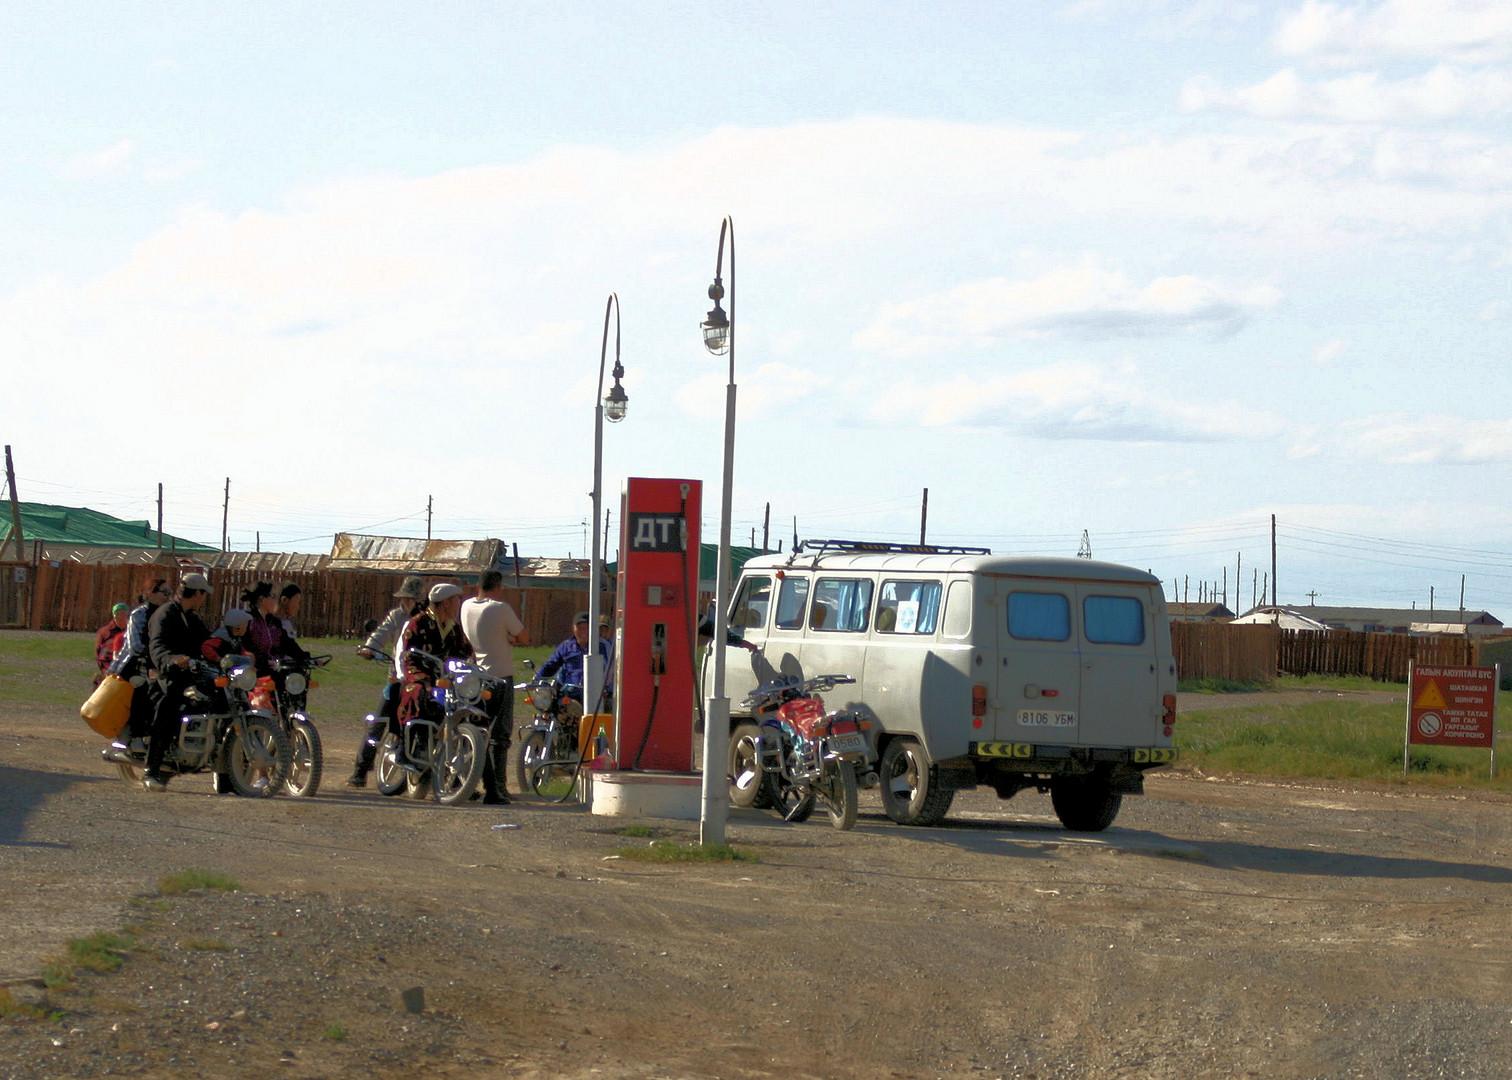 Tankstopp